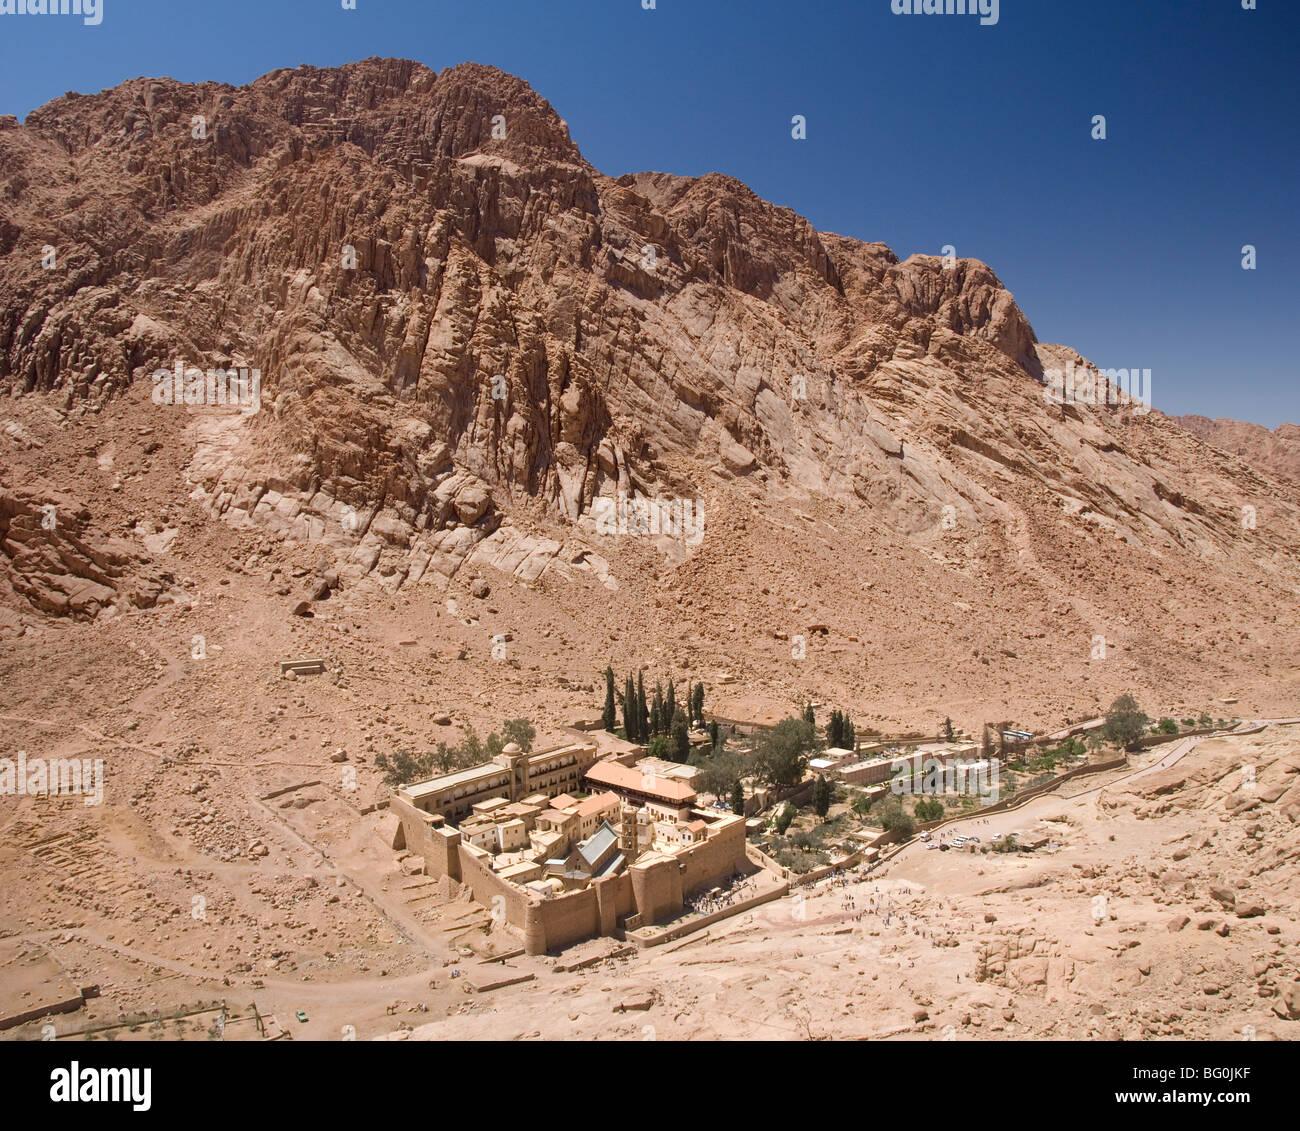 St. Catherine's Monastery, with shoulder of Mount Sinai behind, Sinai Peninsula Desert, Egypt, North Africa - Stock Image